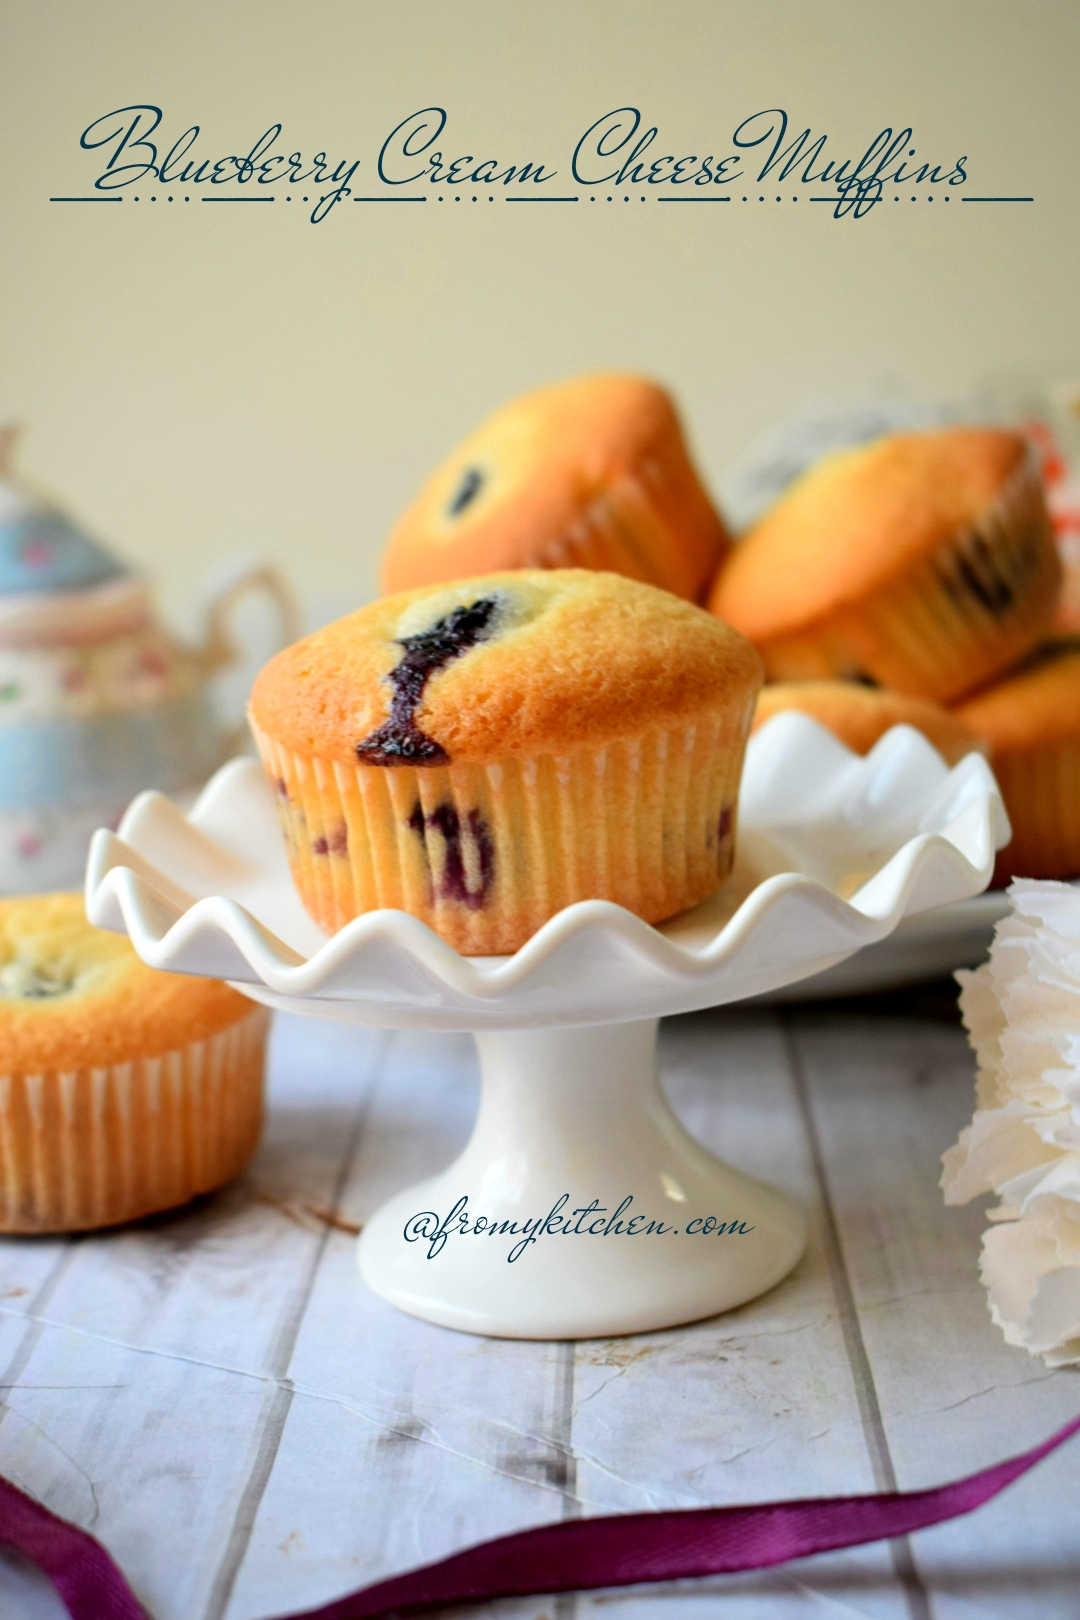 Bluerberry Cream Cheese Muffins